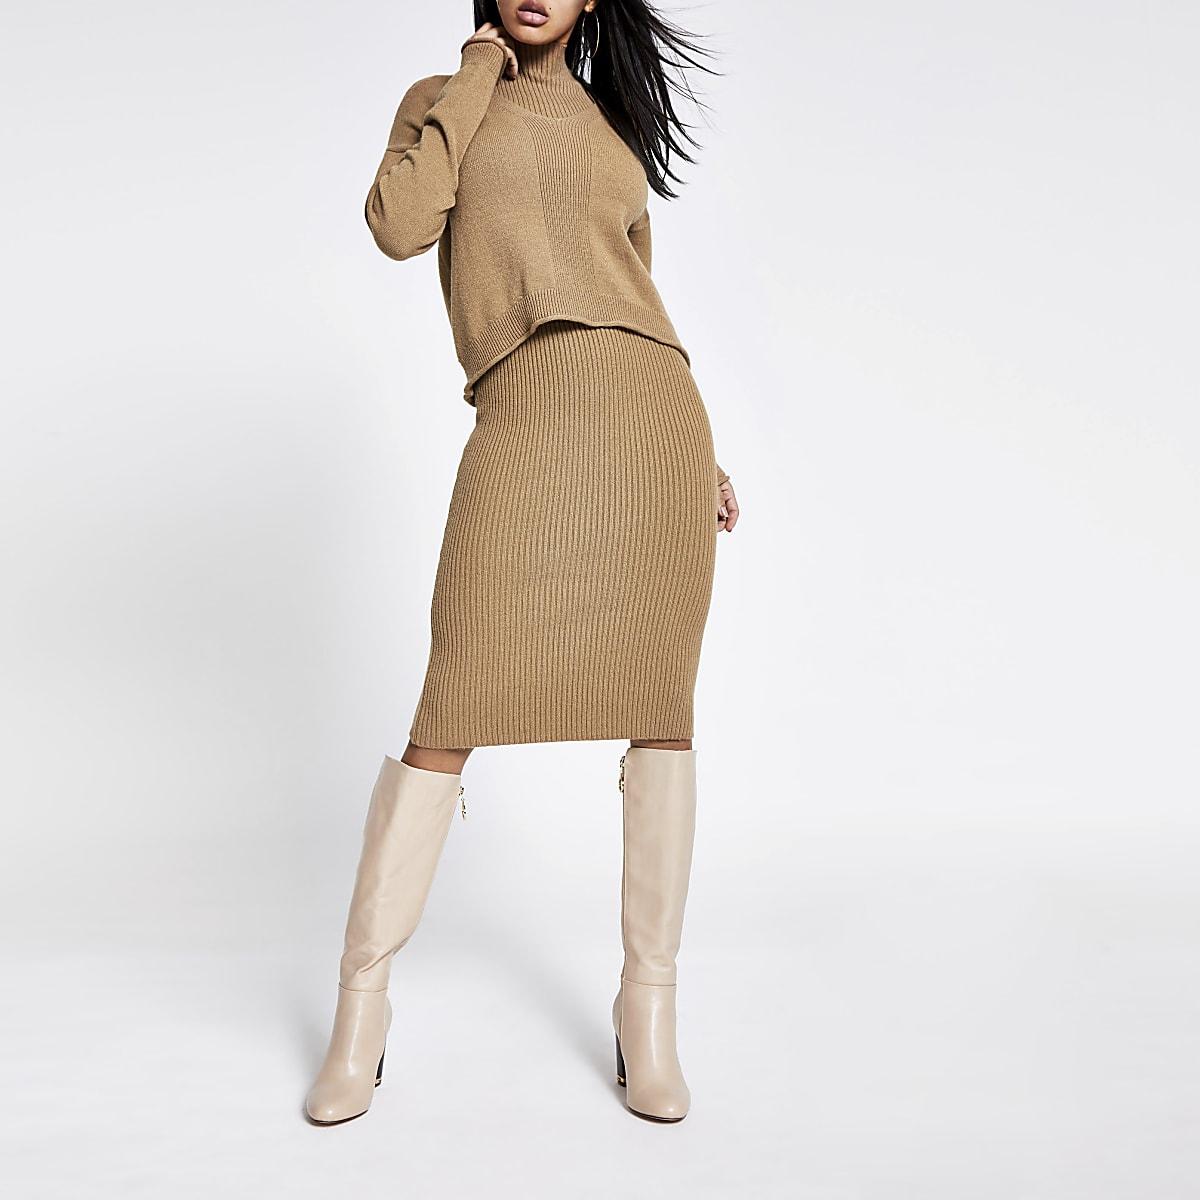 Dark brown layered dress